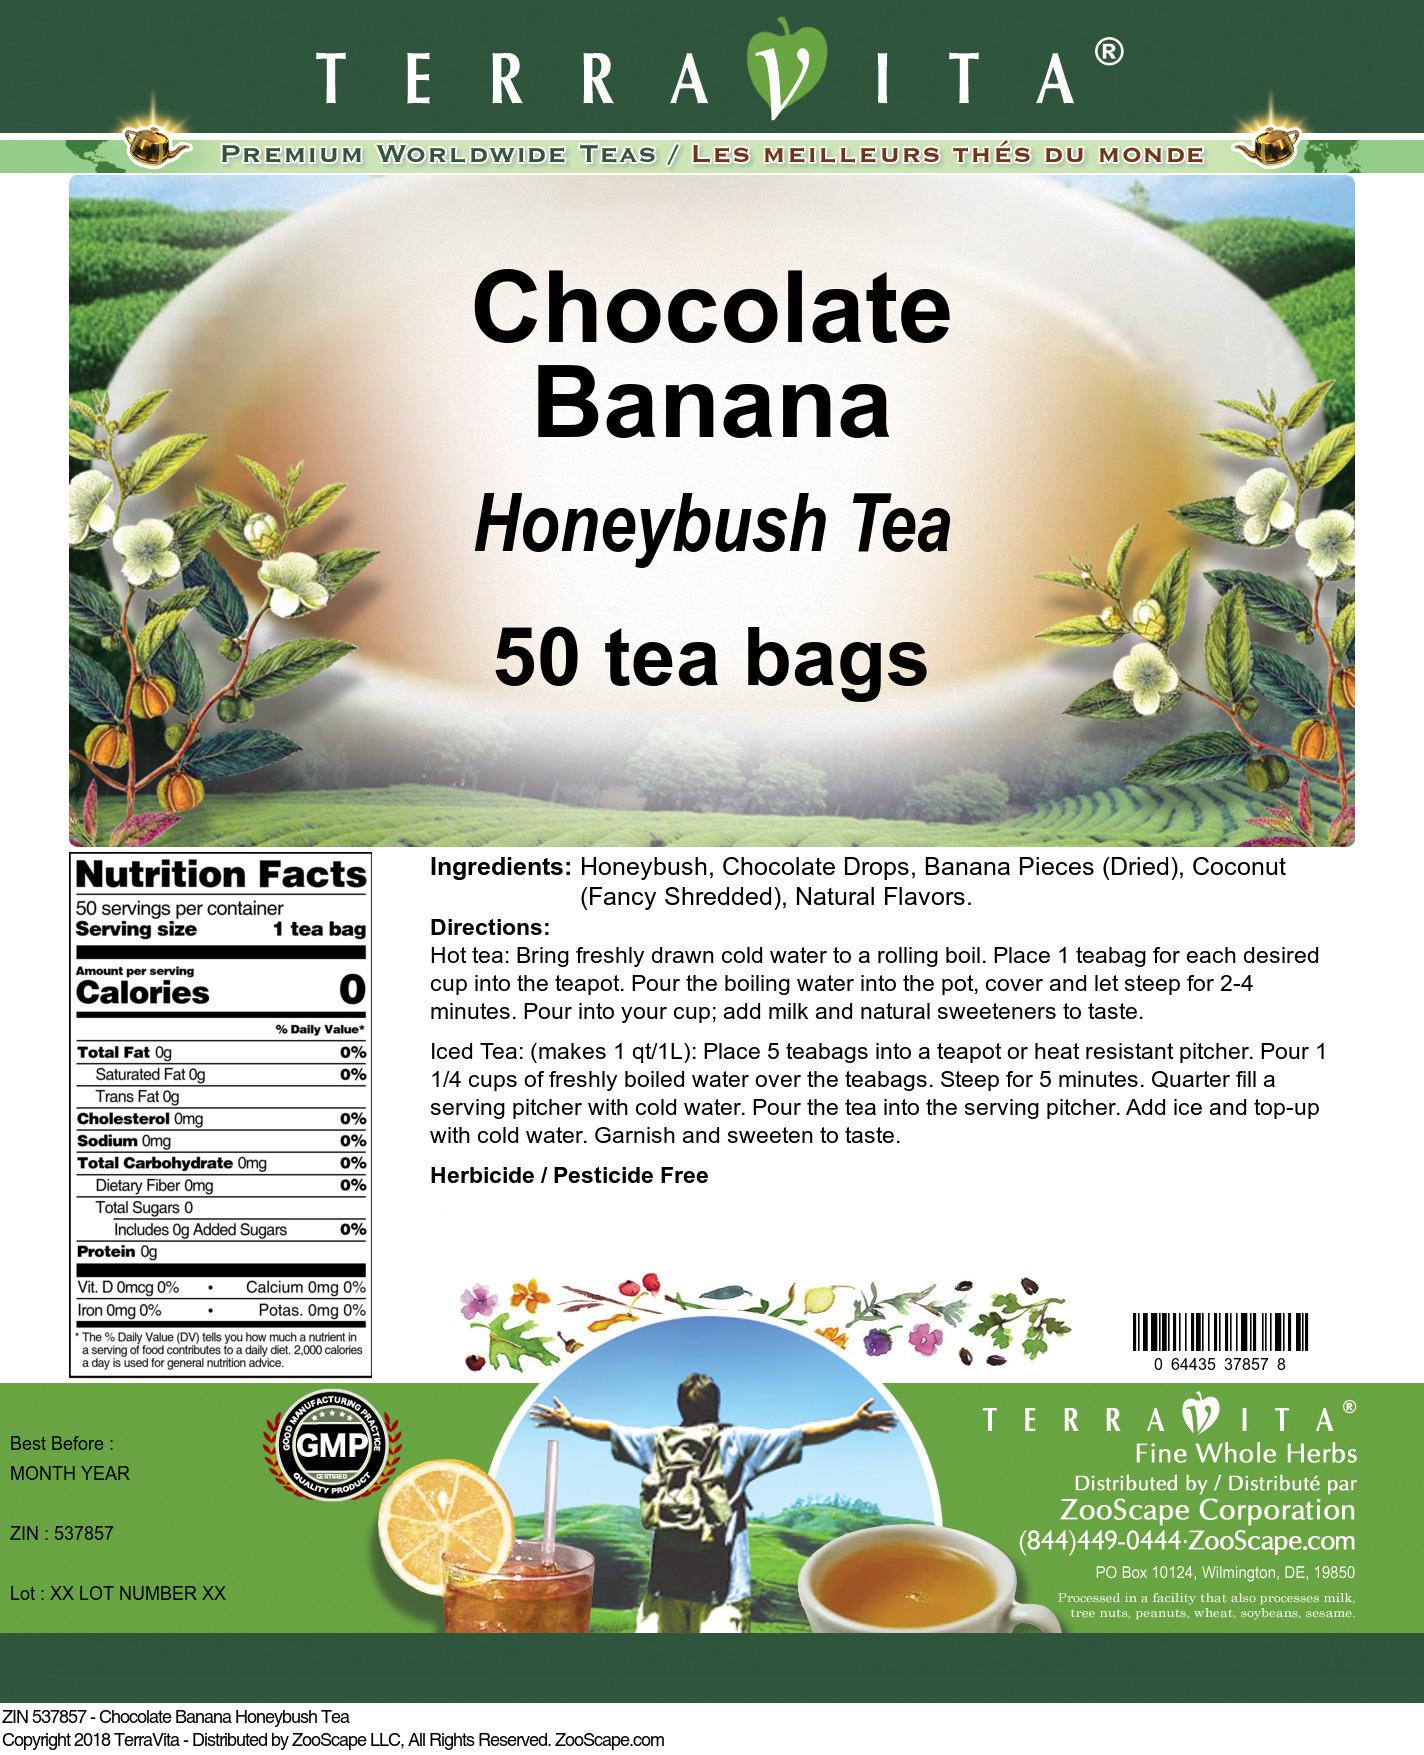 Chocolate Banana Honeybush Tea